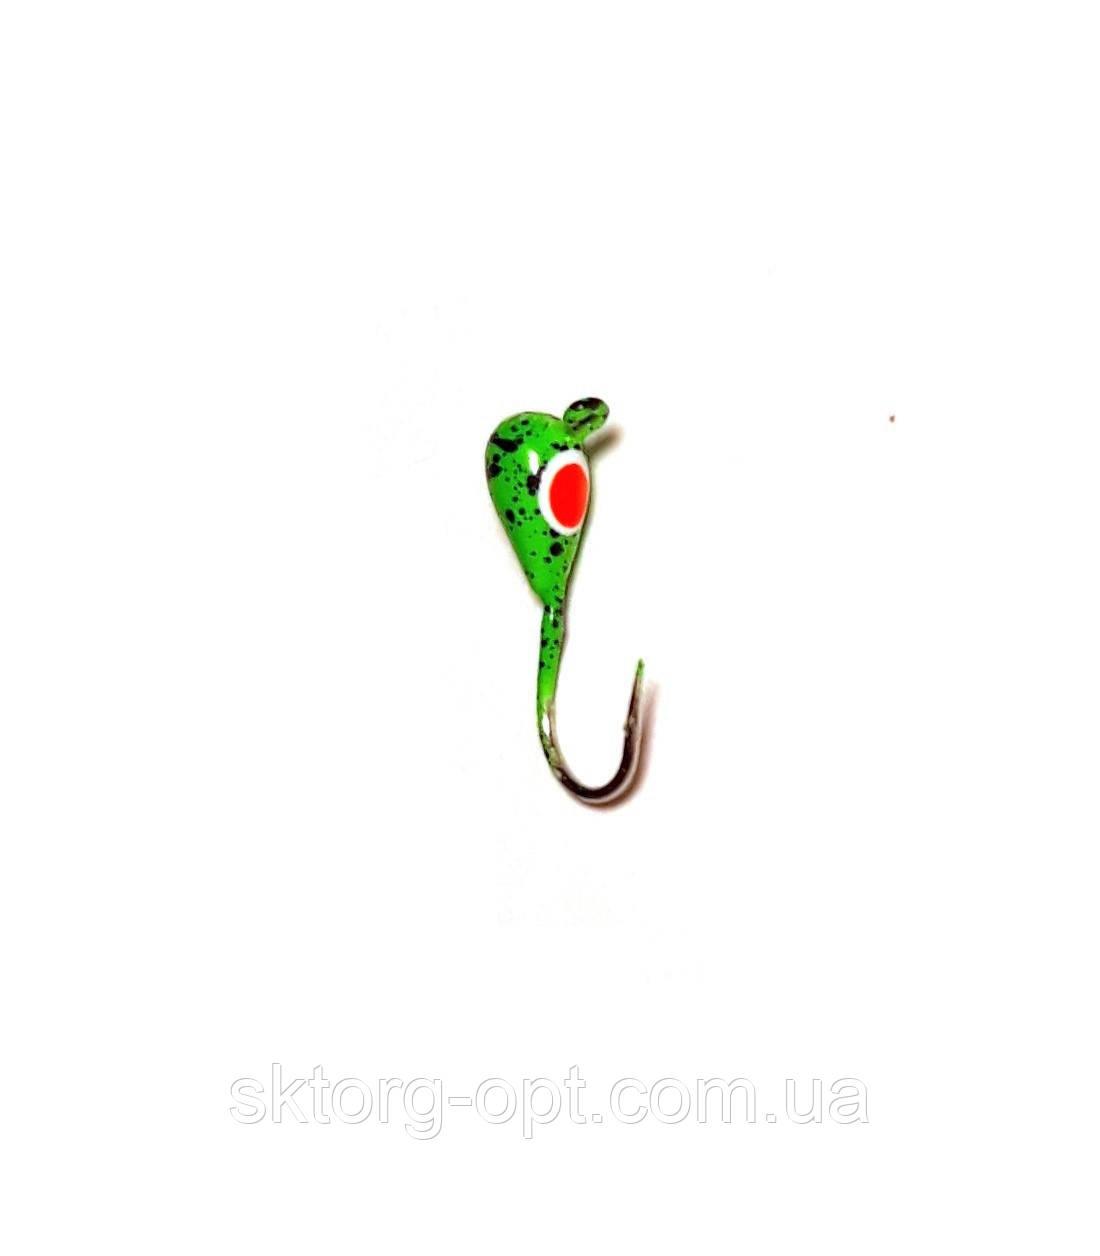 Мормышка вольфрам Капля с ушком 0.47г. 1130-49